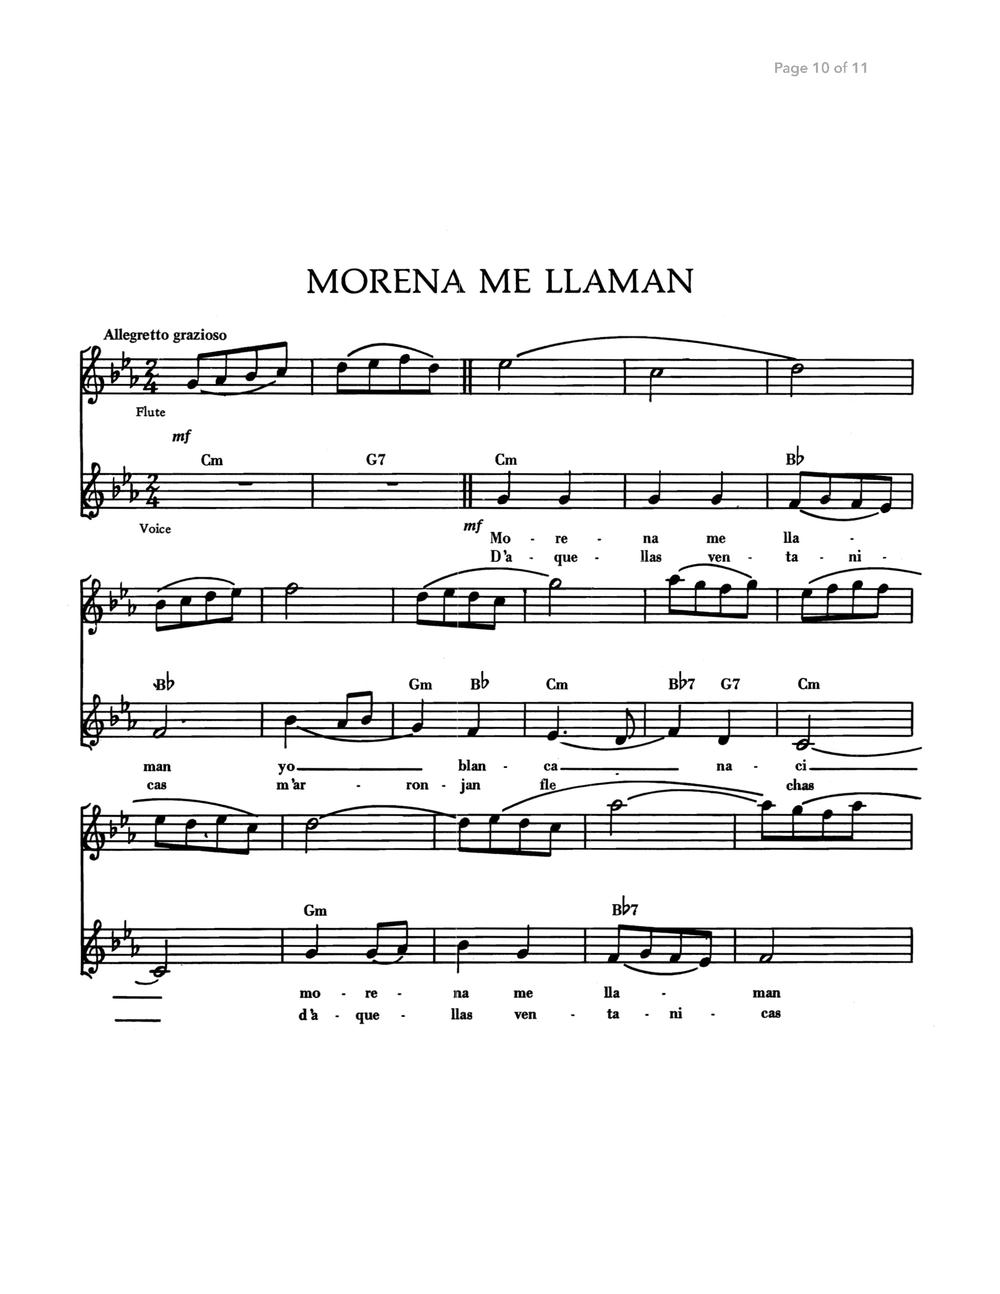 Ladino_Sephardic Music_Page_10.png